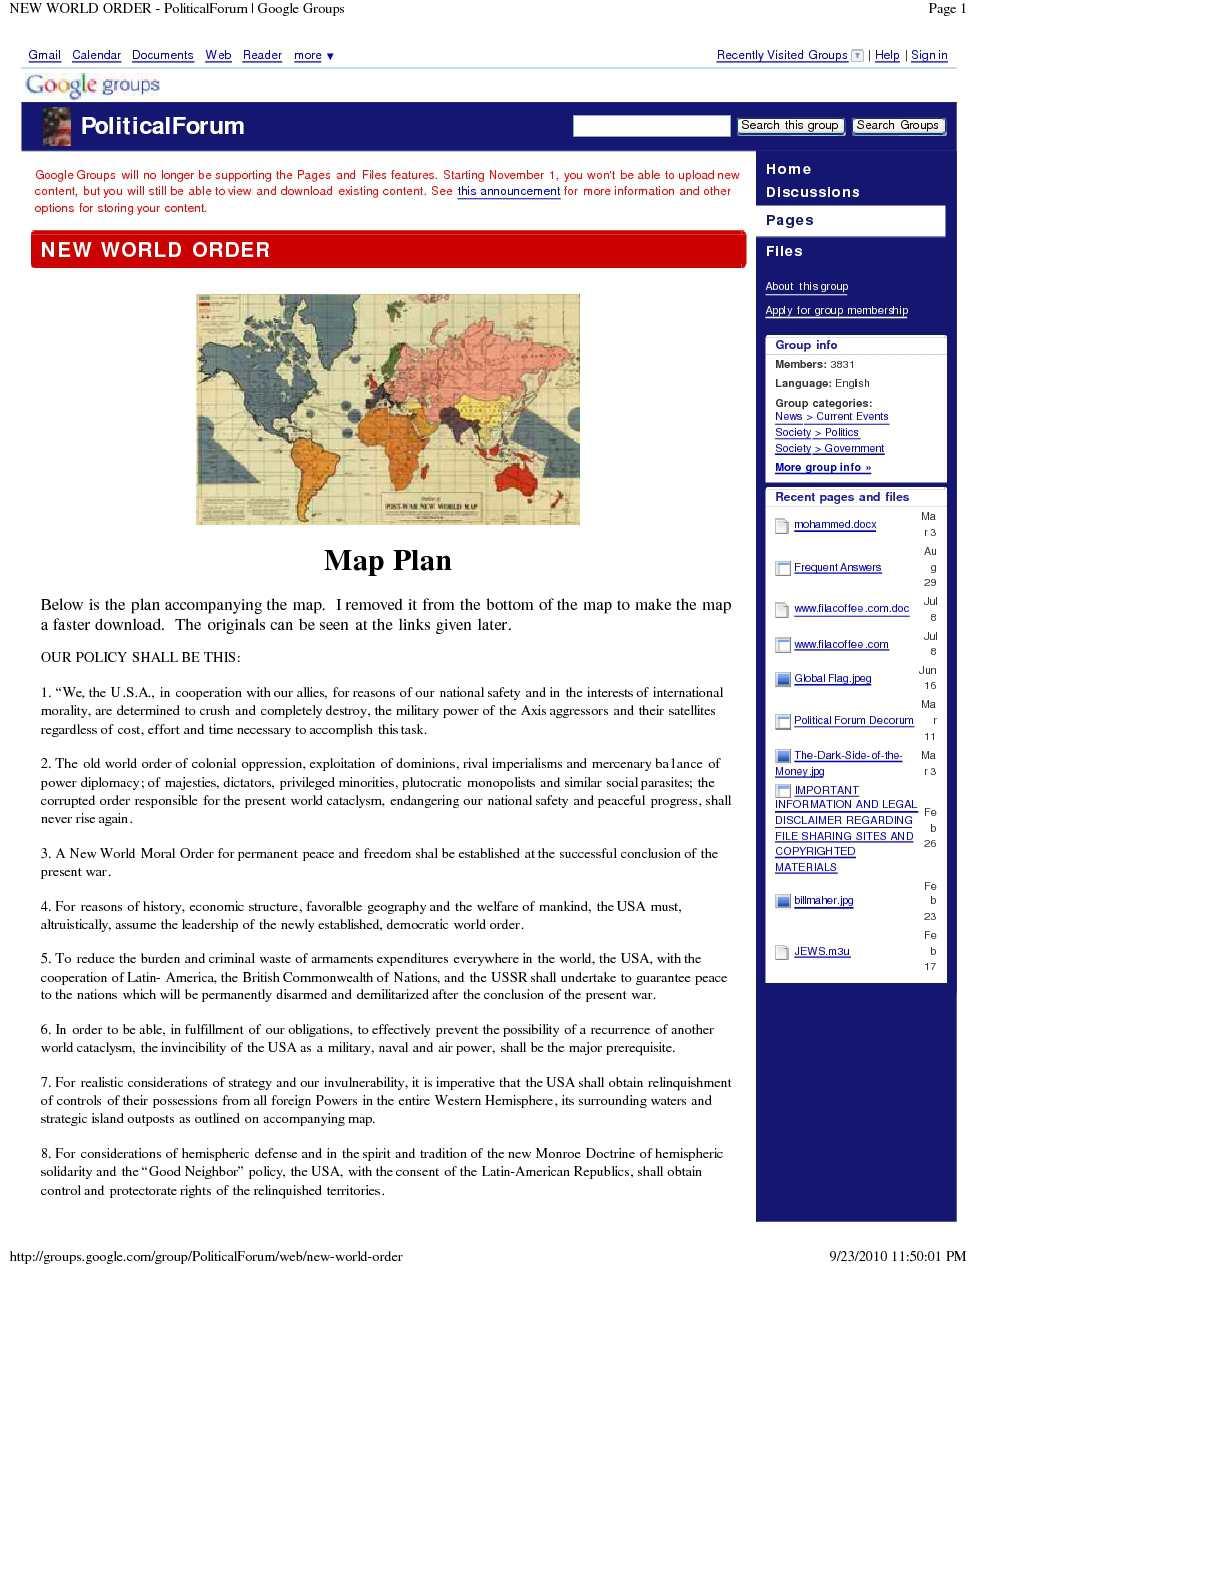 Calam O NEW WORLD MORAL ORDER PoliticalForum Google